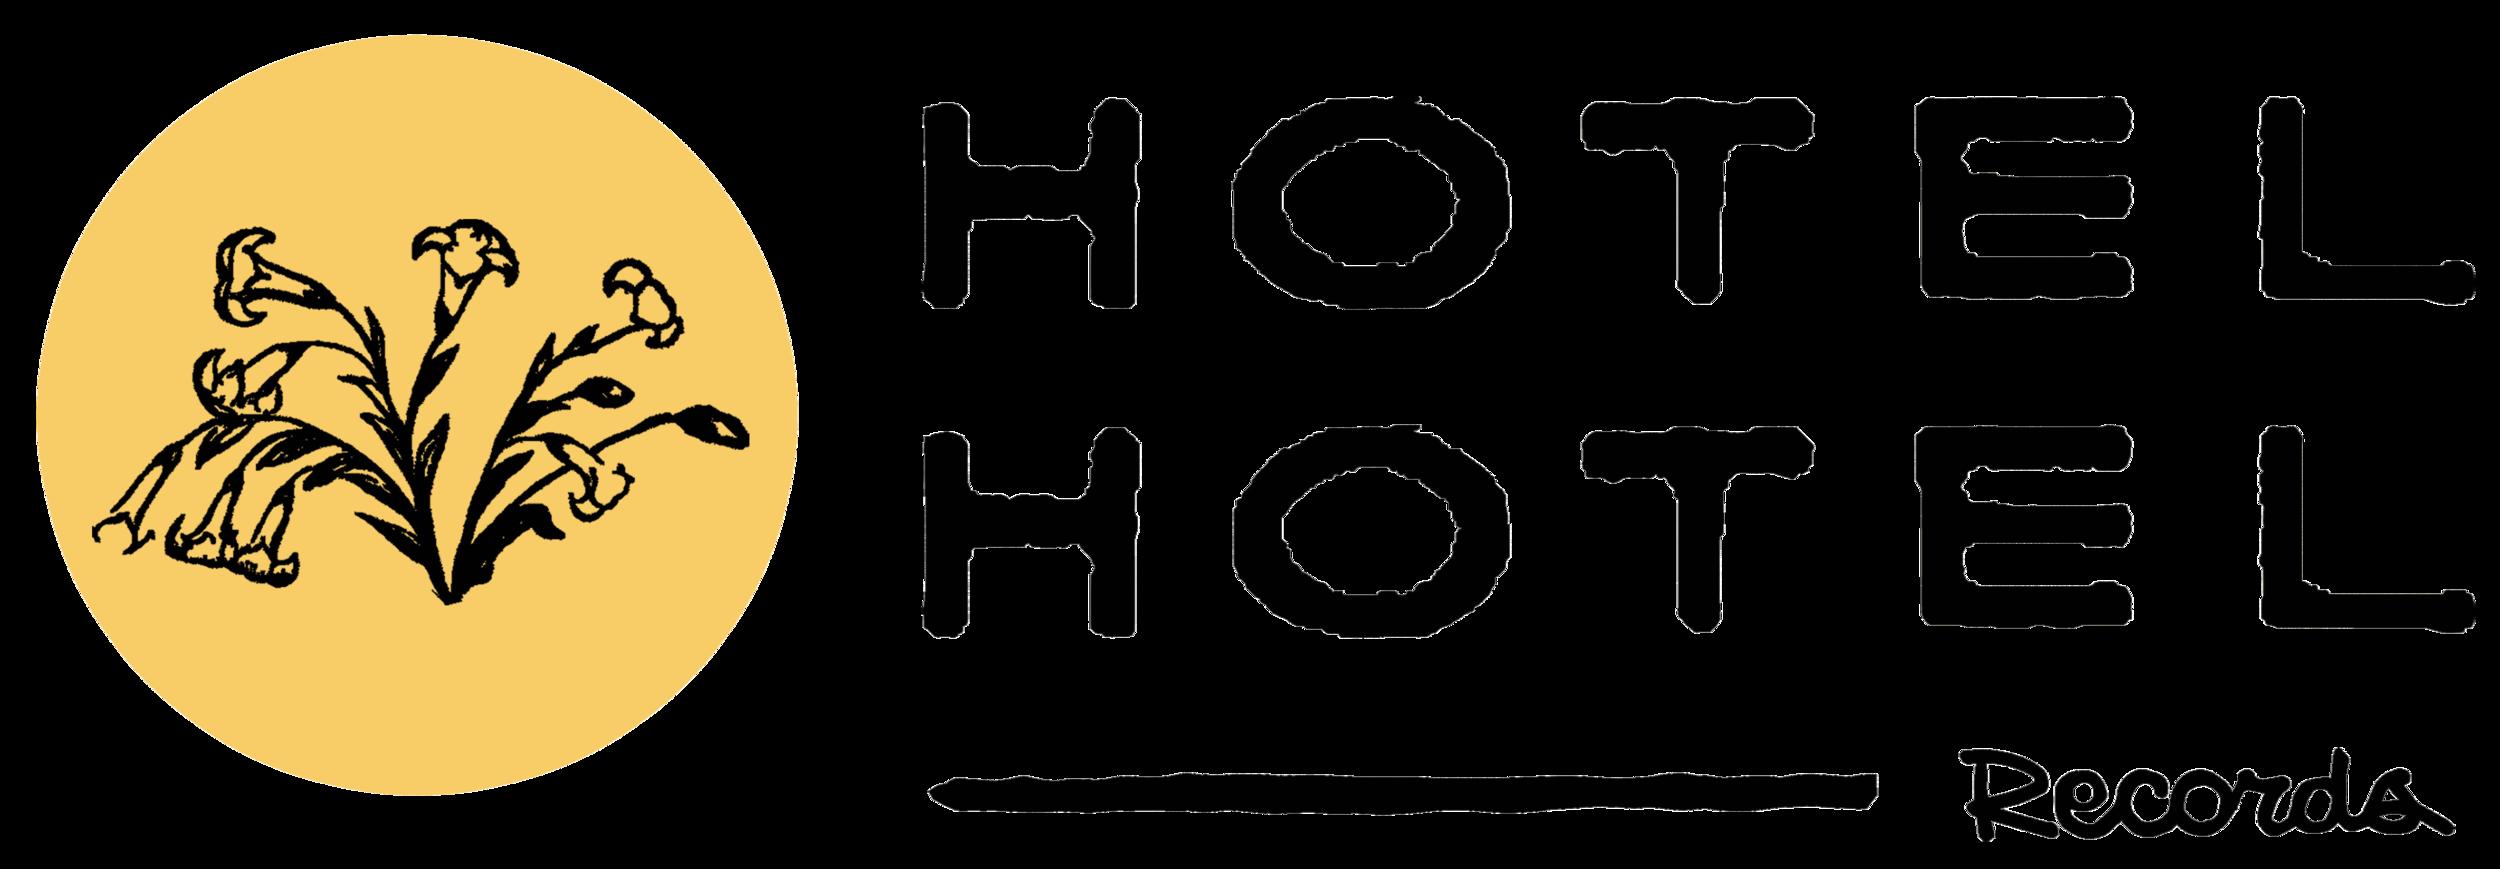 HOTELHOTELrectangleCOLOR.png